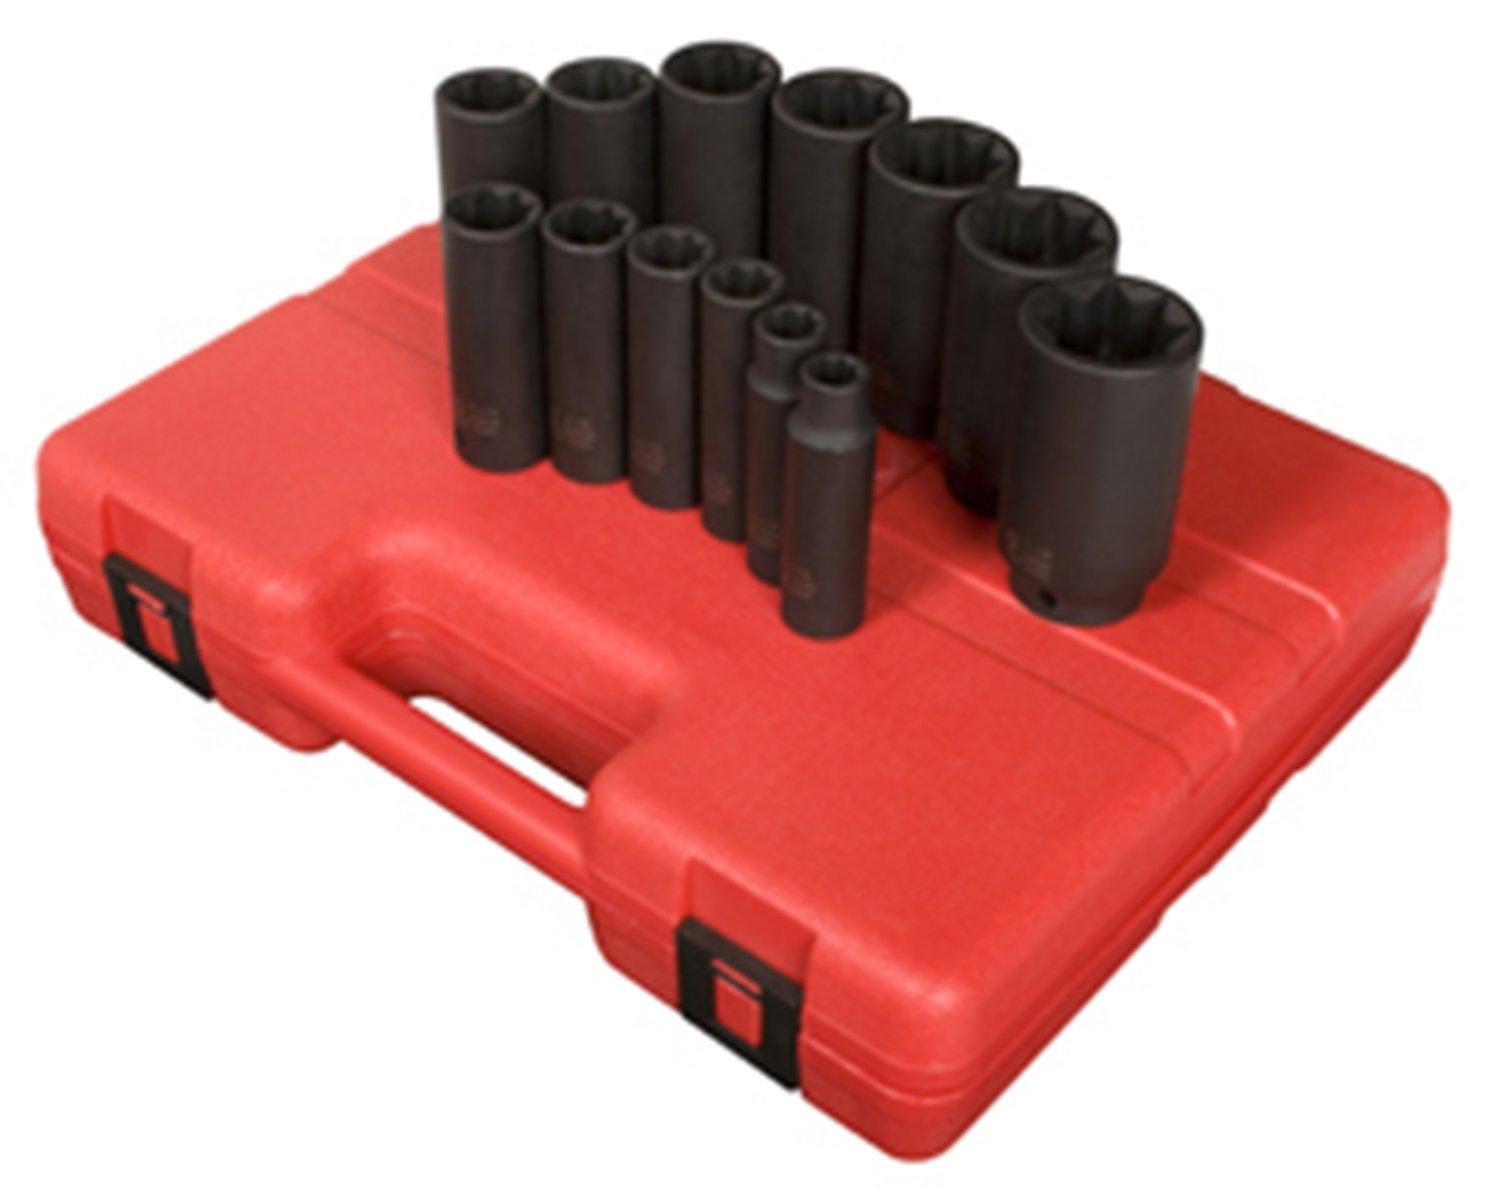 Sunex 2858 1/2-Inch Drive Deep 8-Point SAE Impact Socket Set, 13-Piece Sunex International